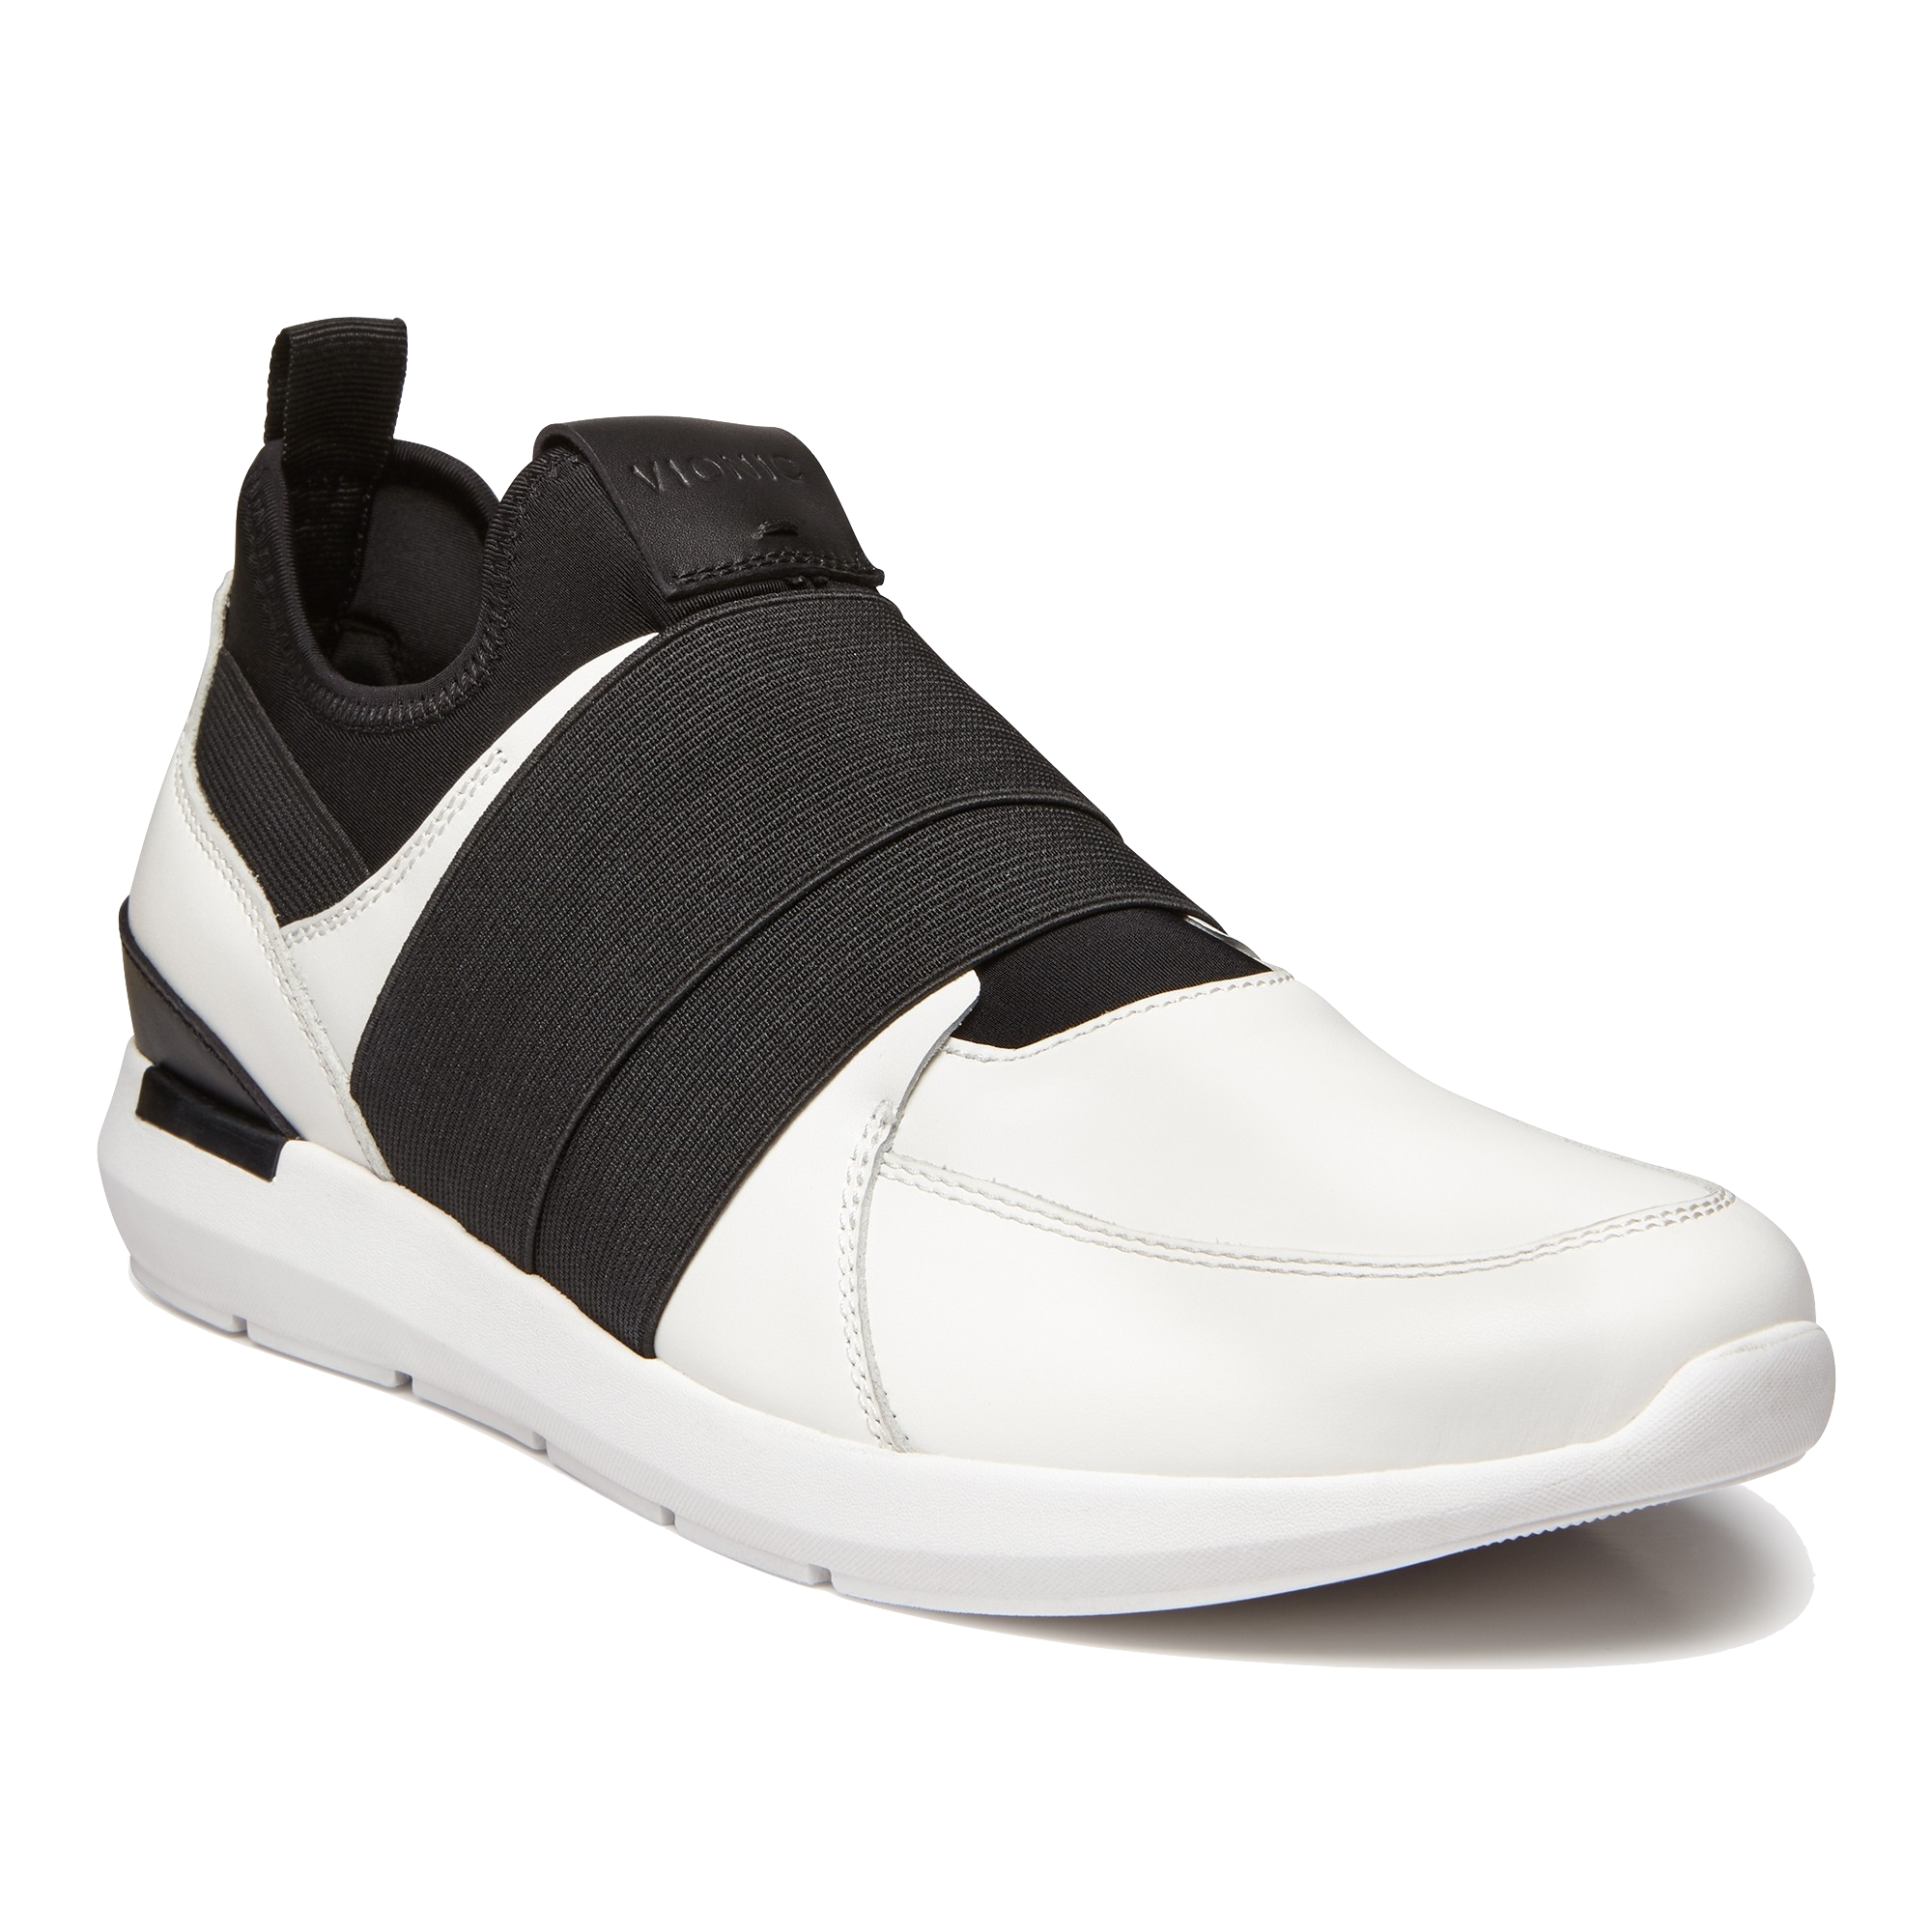 vionic jackson sneakers